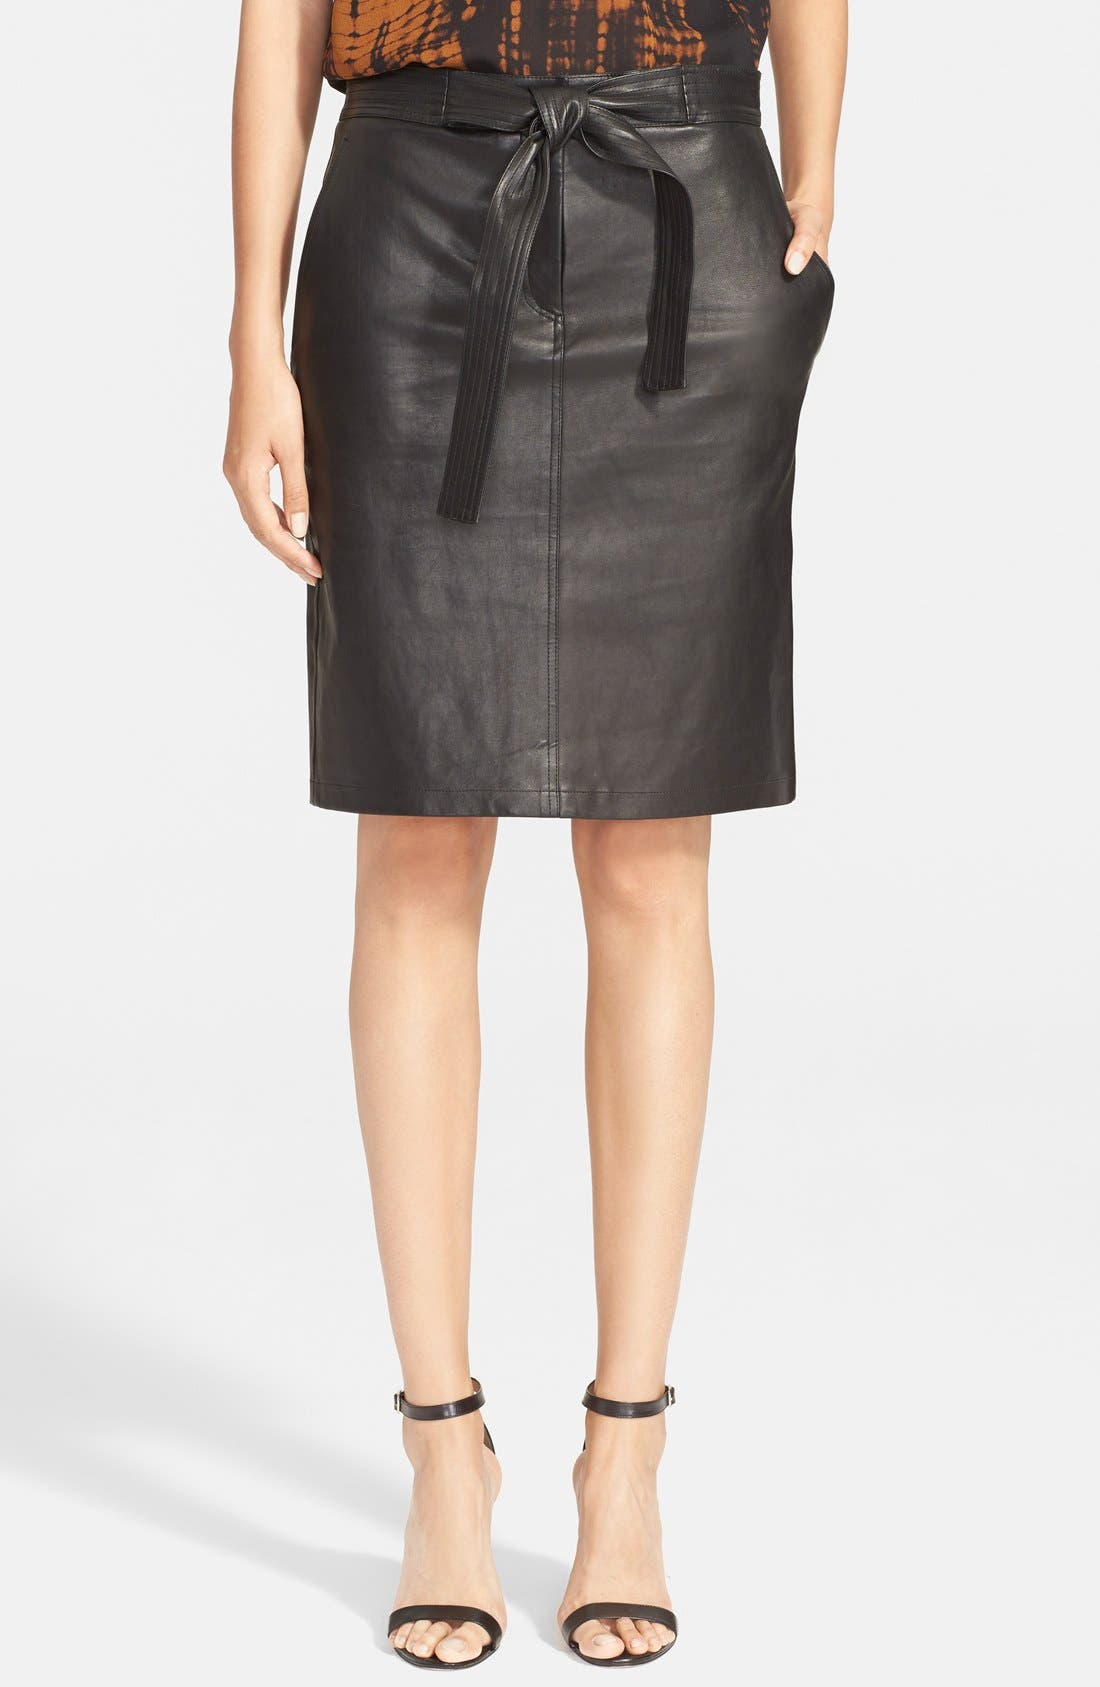 Main Image - A.L.C. 'Abigail' Leather Pencil Skirt